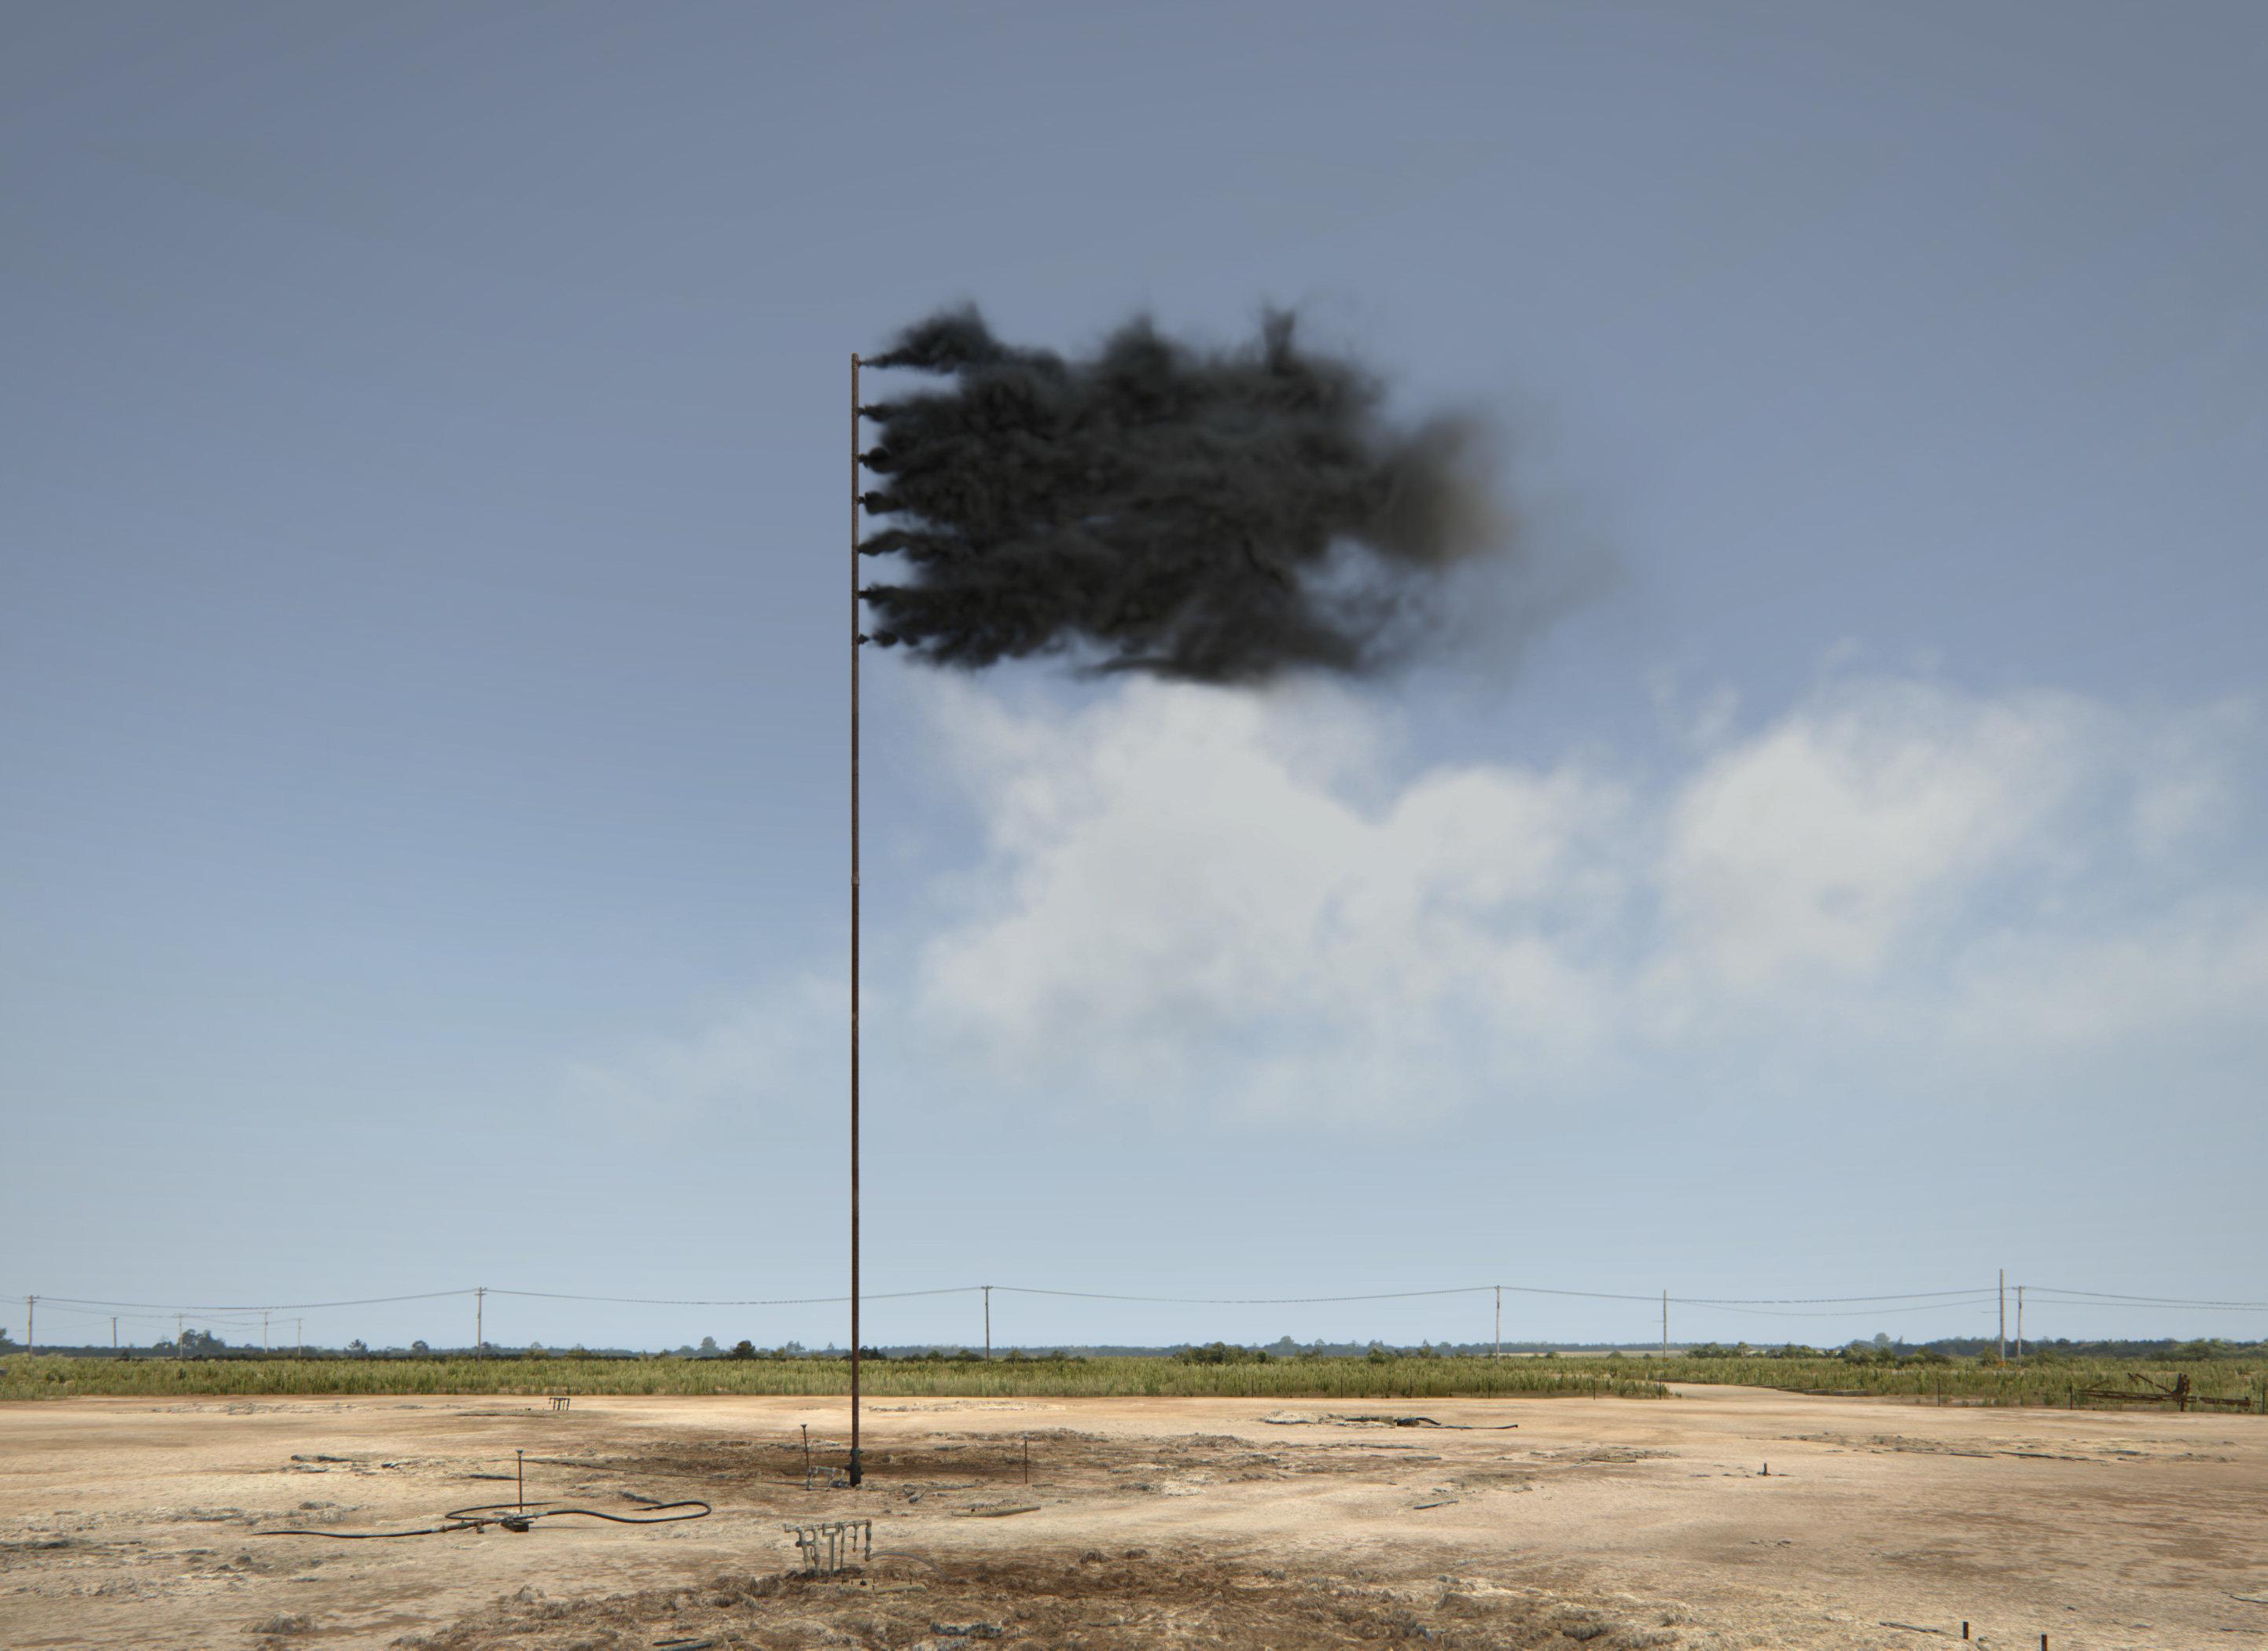 Western Flag (Spindletop, Texas 2017), a virtual art installation by Irish artist John Gerrard, uses a haunting image to symb